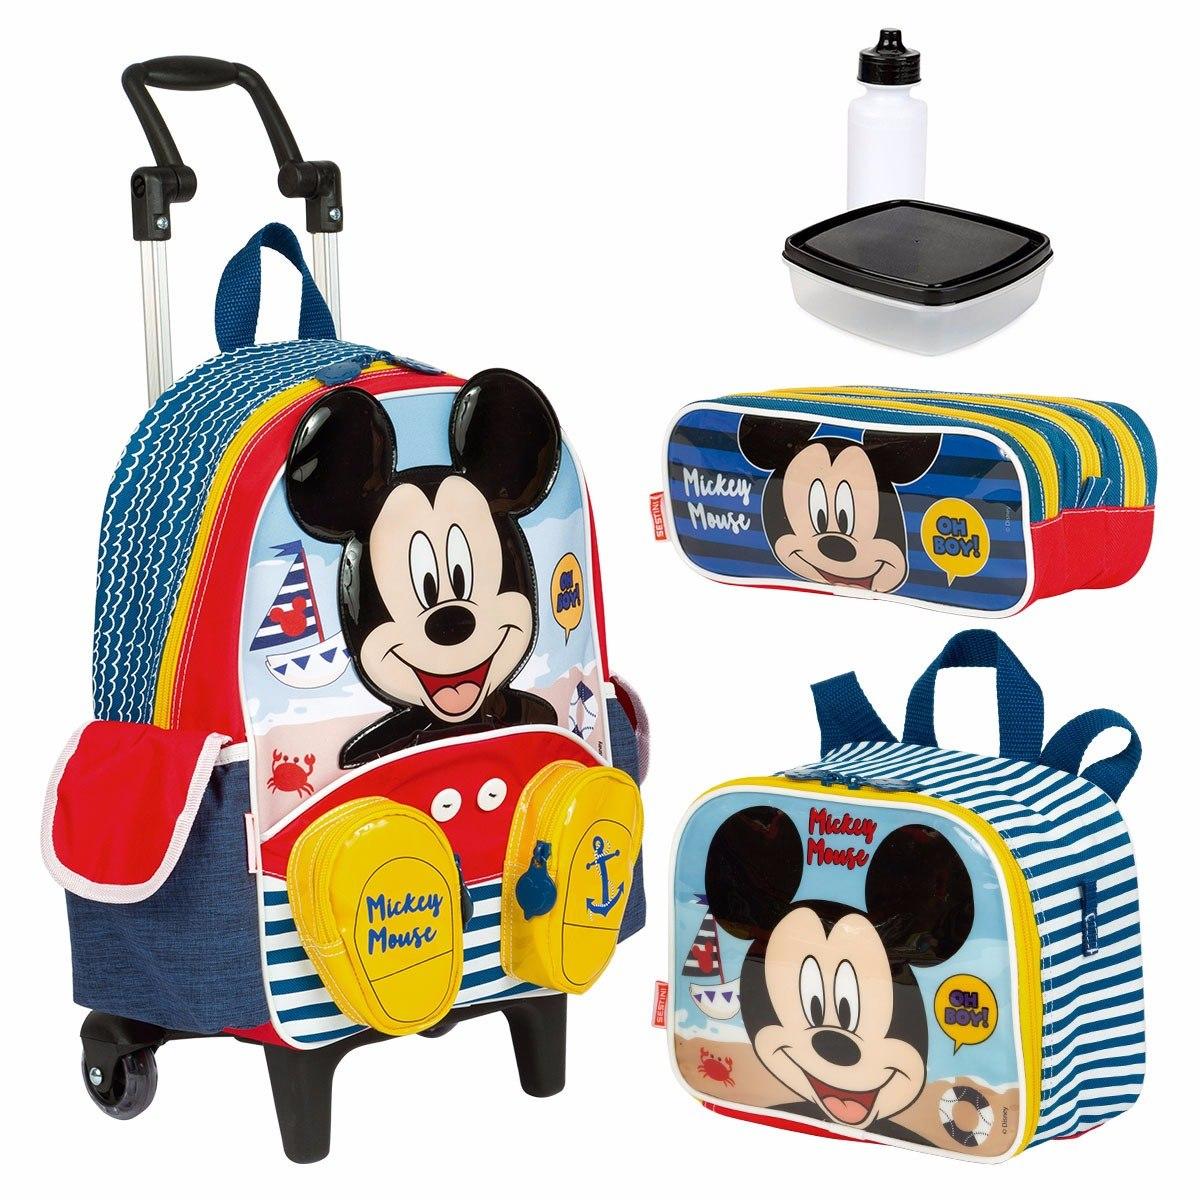 b5e8f3d8411e1a kit mochila infantil lancheira estojo mickey mouse m sestini. Carregando  zoom.